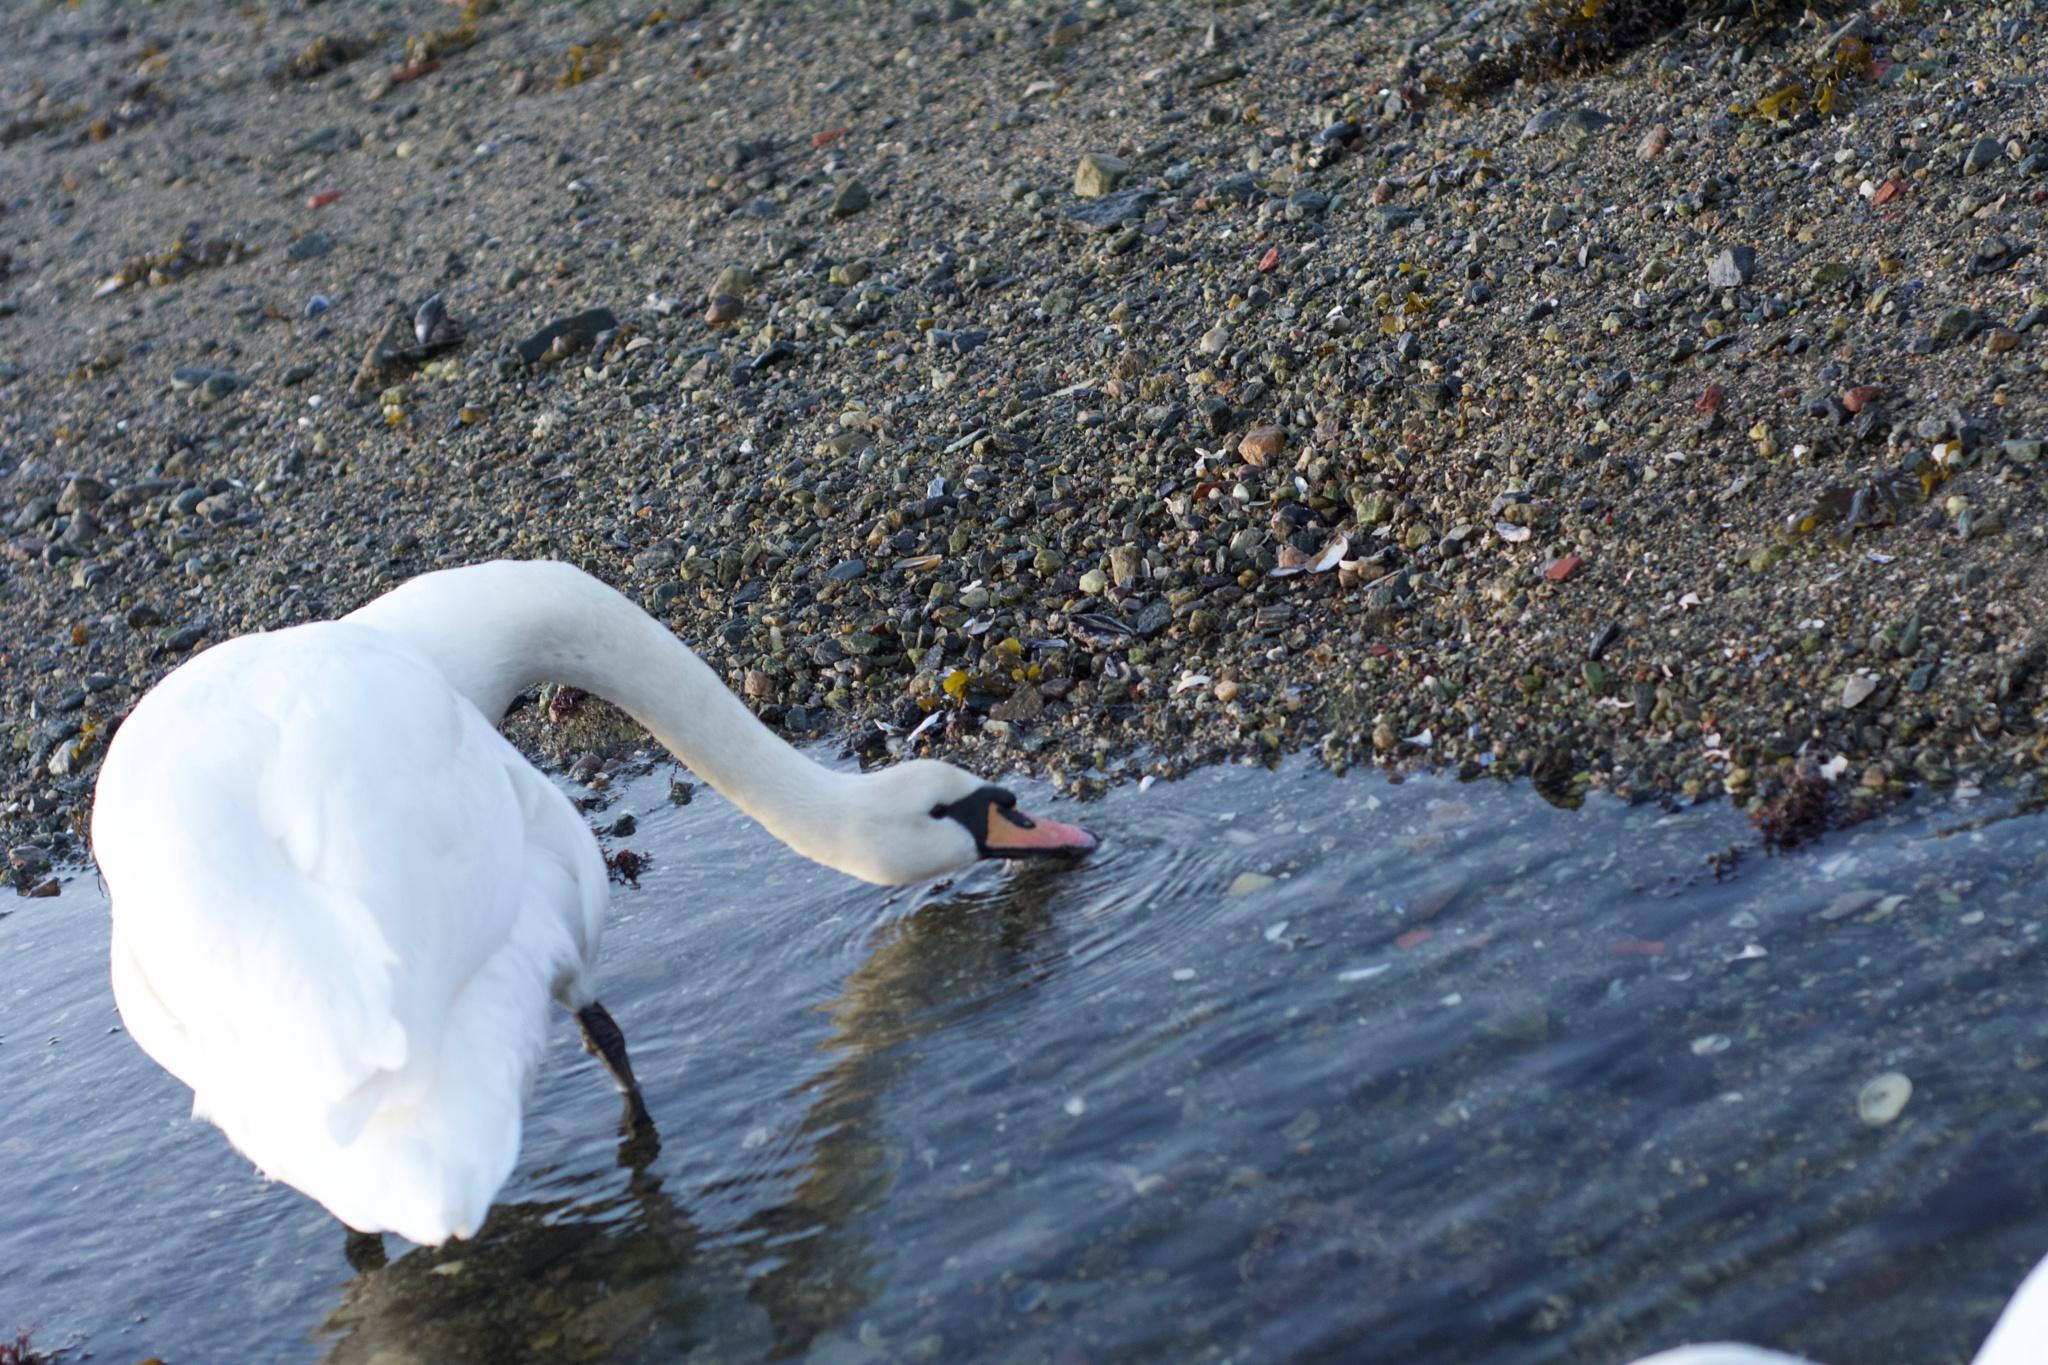 Swan [05] by Lars-Toralf Utnes Storstrand